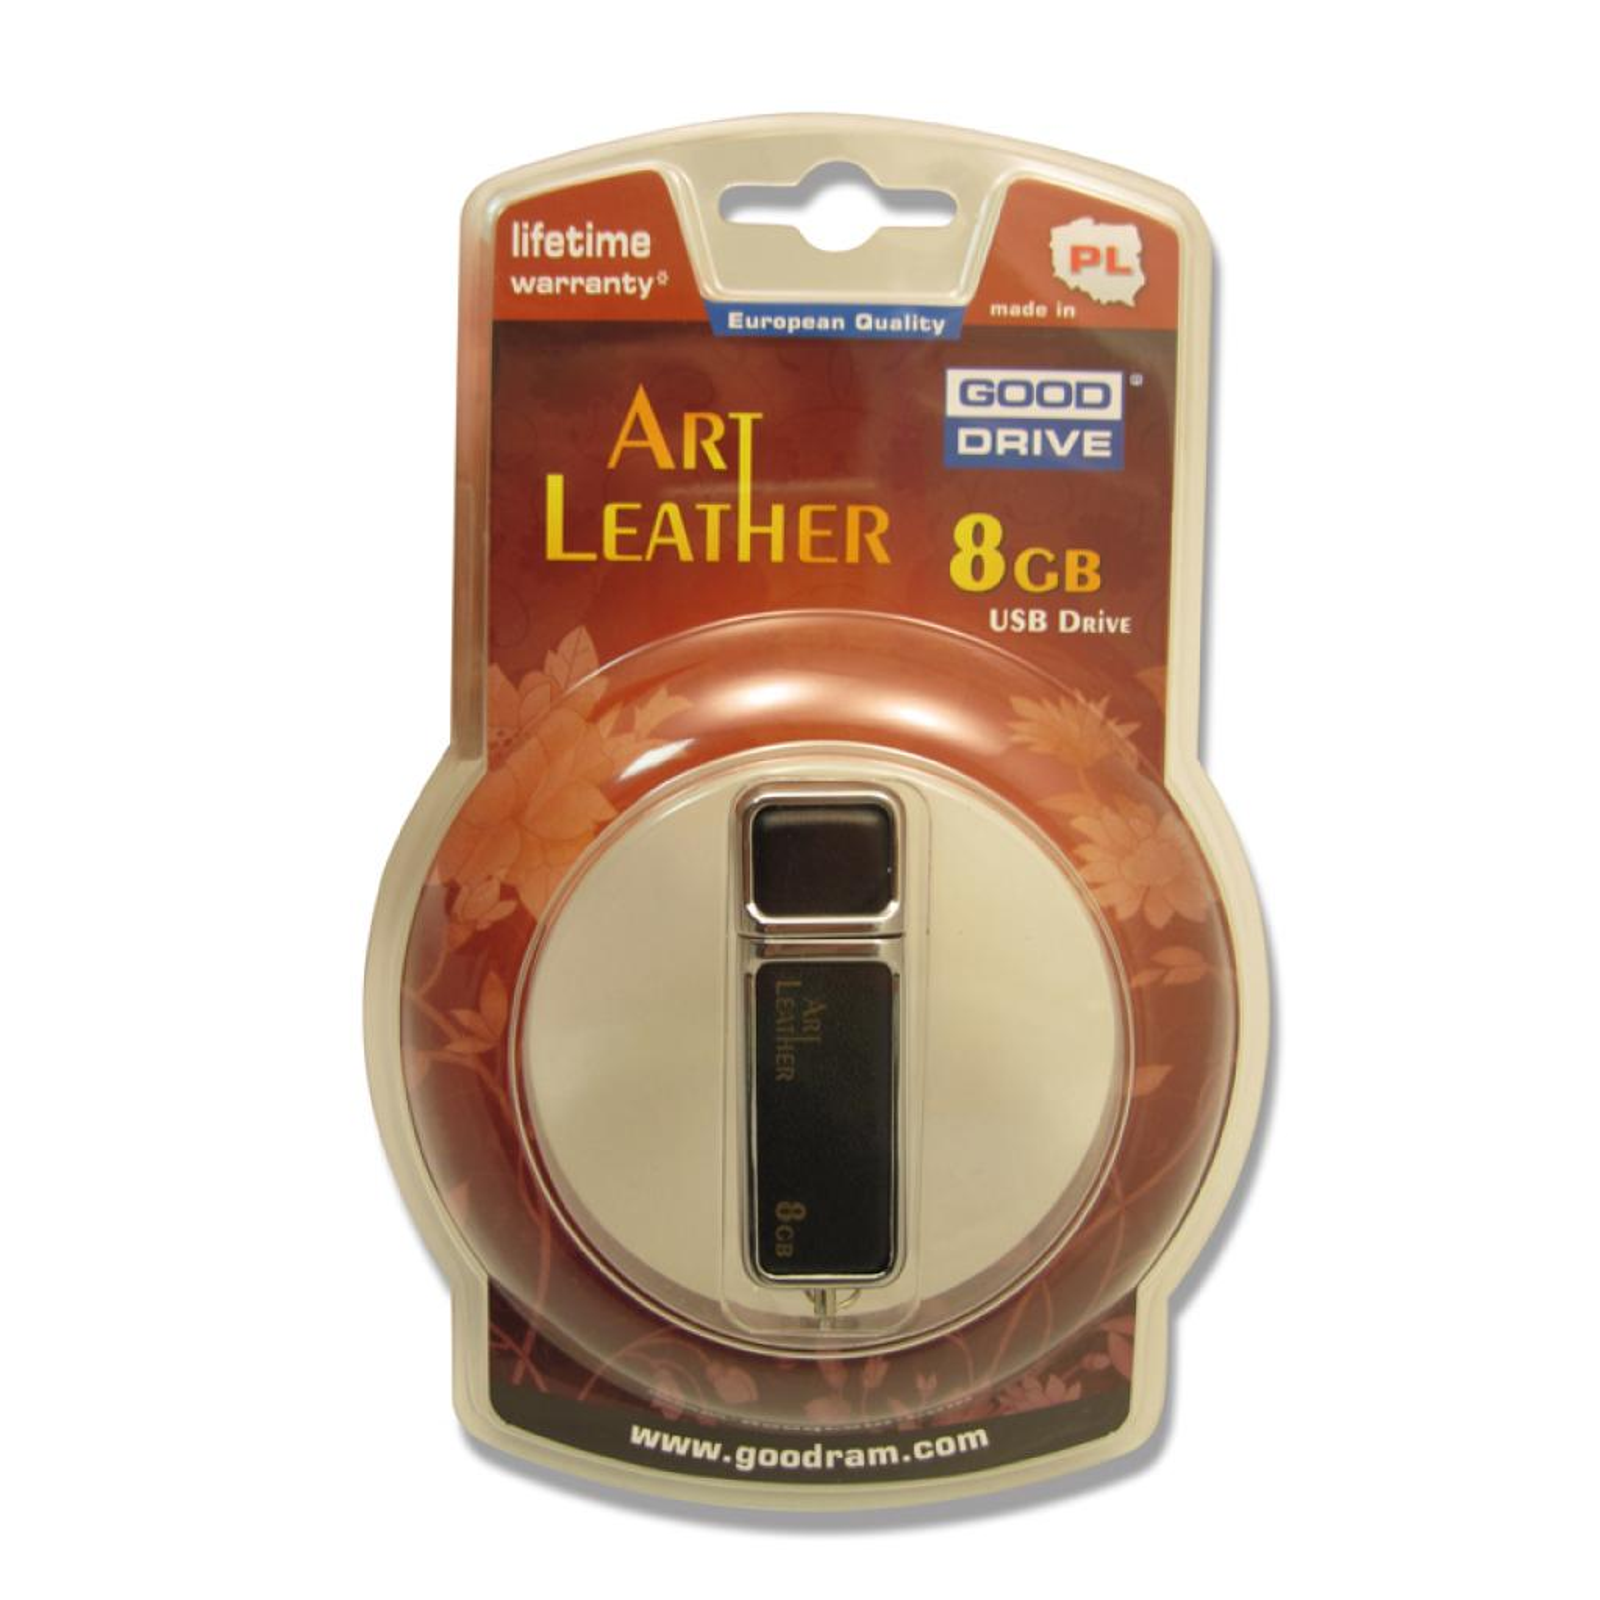 USB флеш накопитель 8GB USB 2.0 Art Leather GOODRAM (PD8GH2GRALKR9) изображение 3